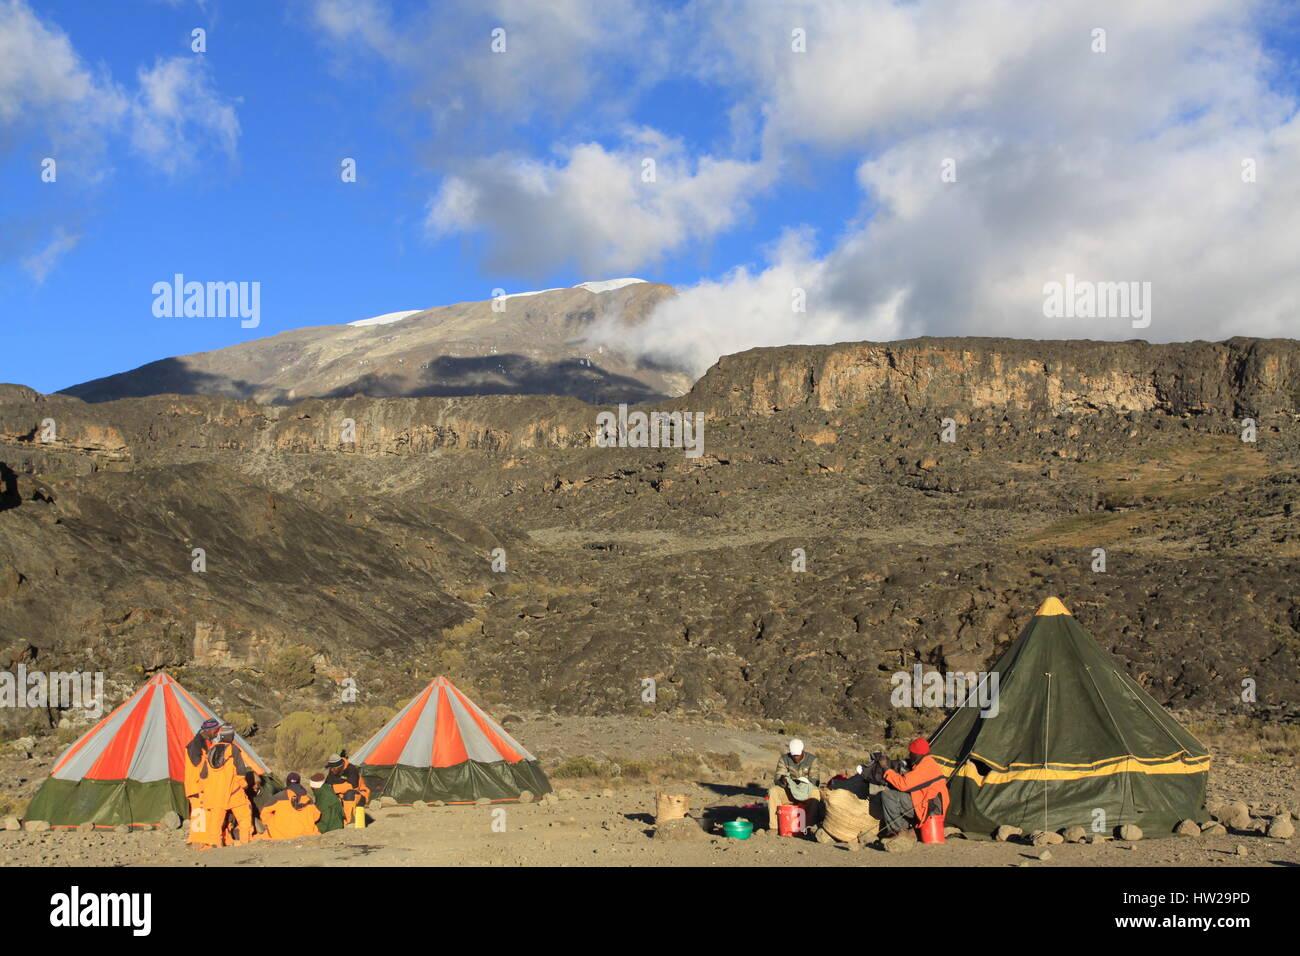 Camping on Mount Kilimanjaro - Stock Image